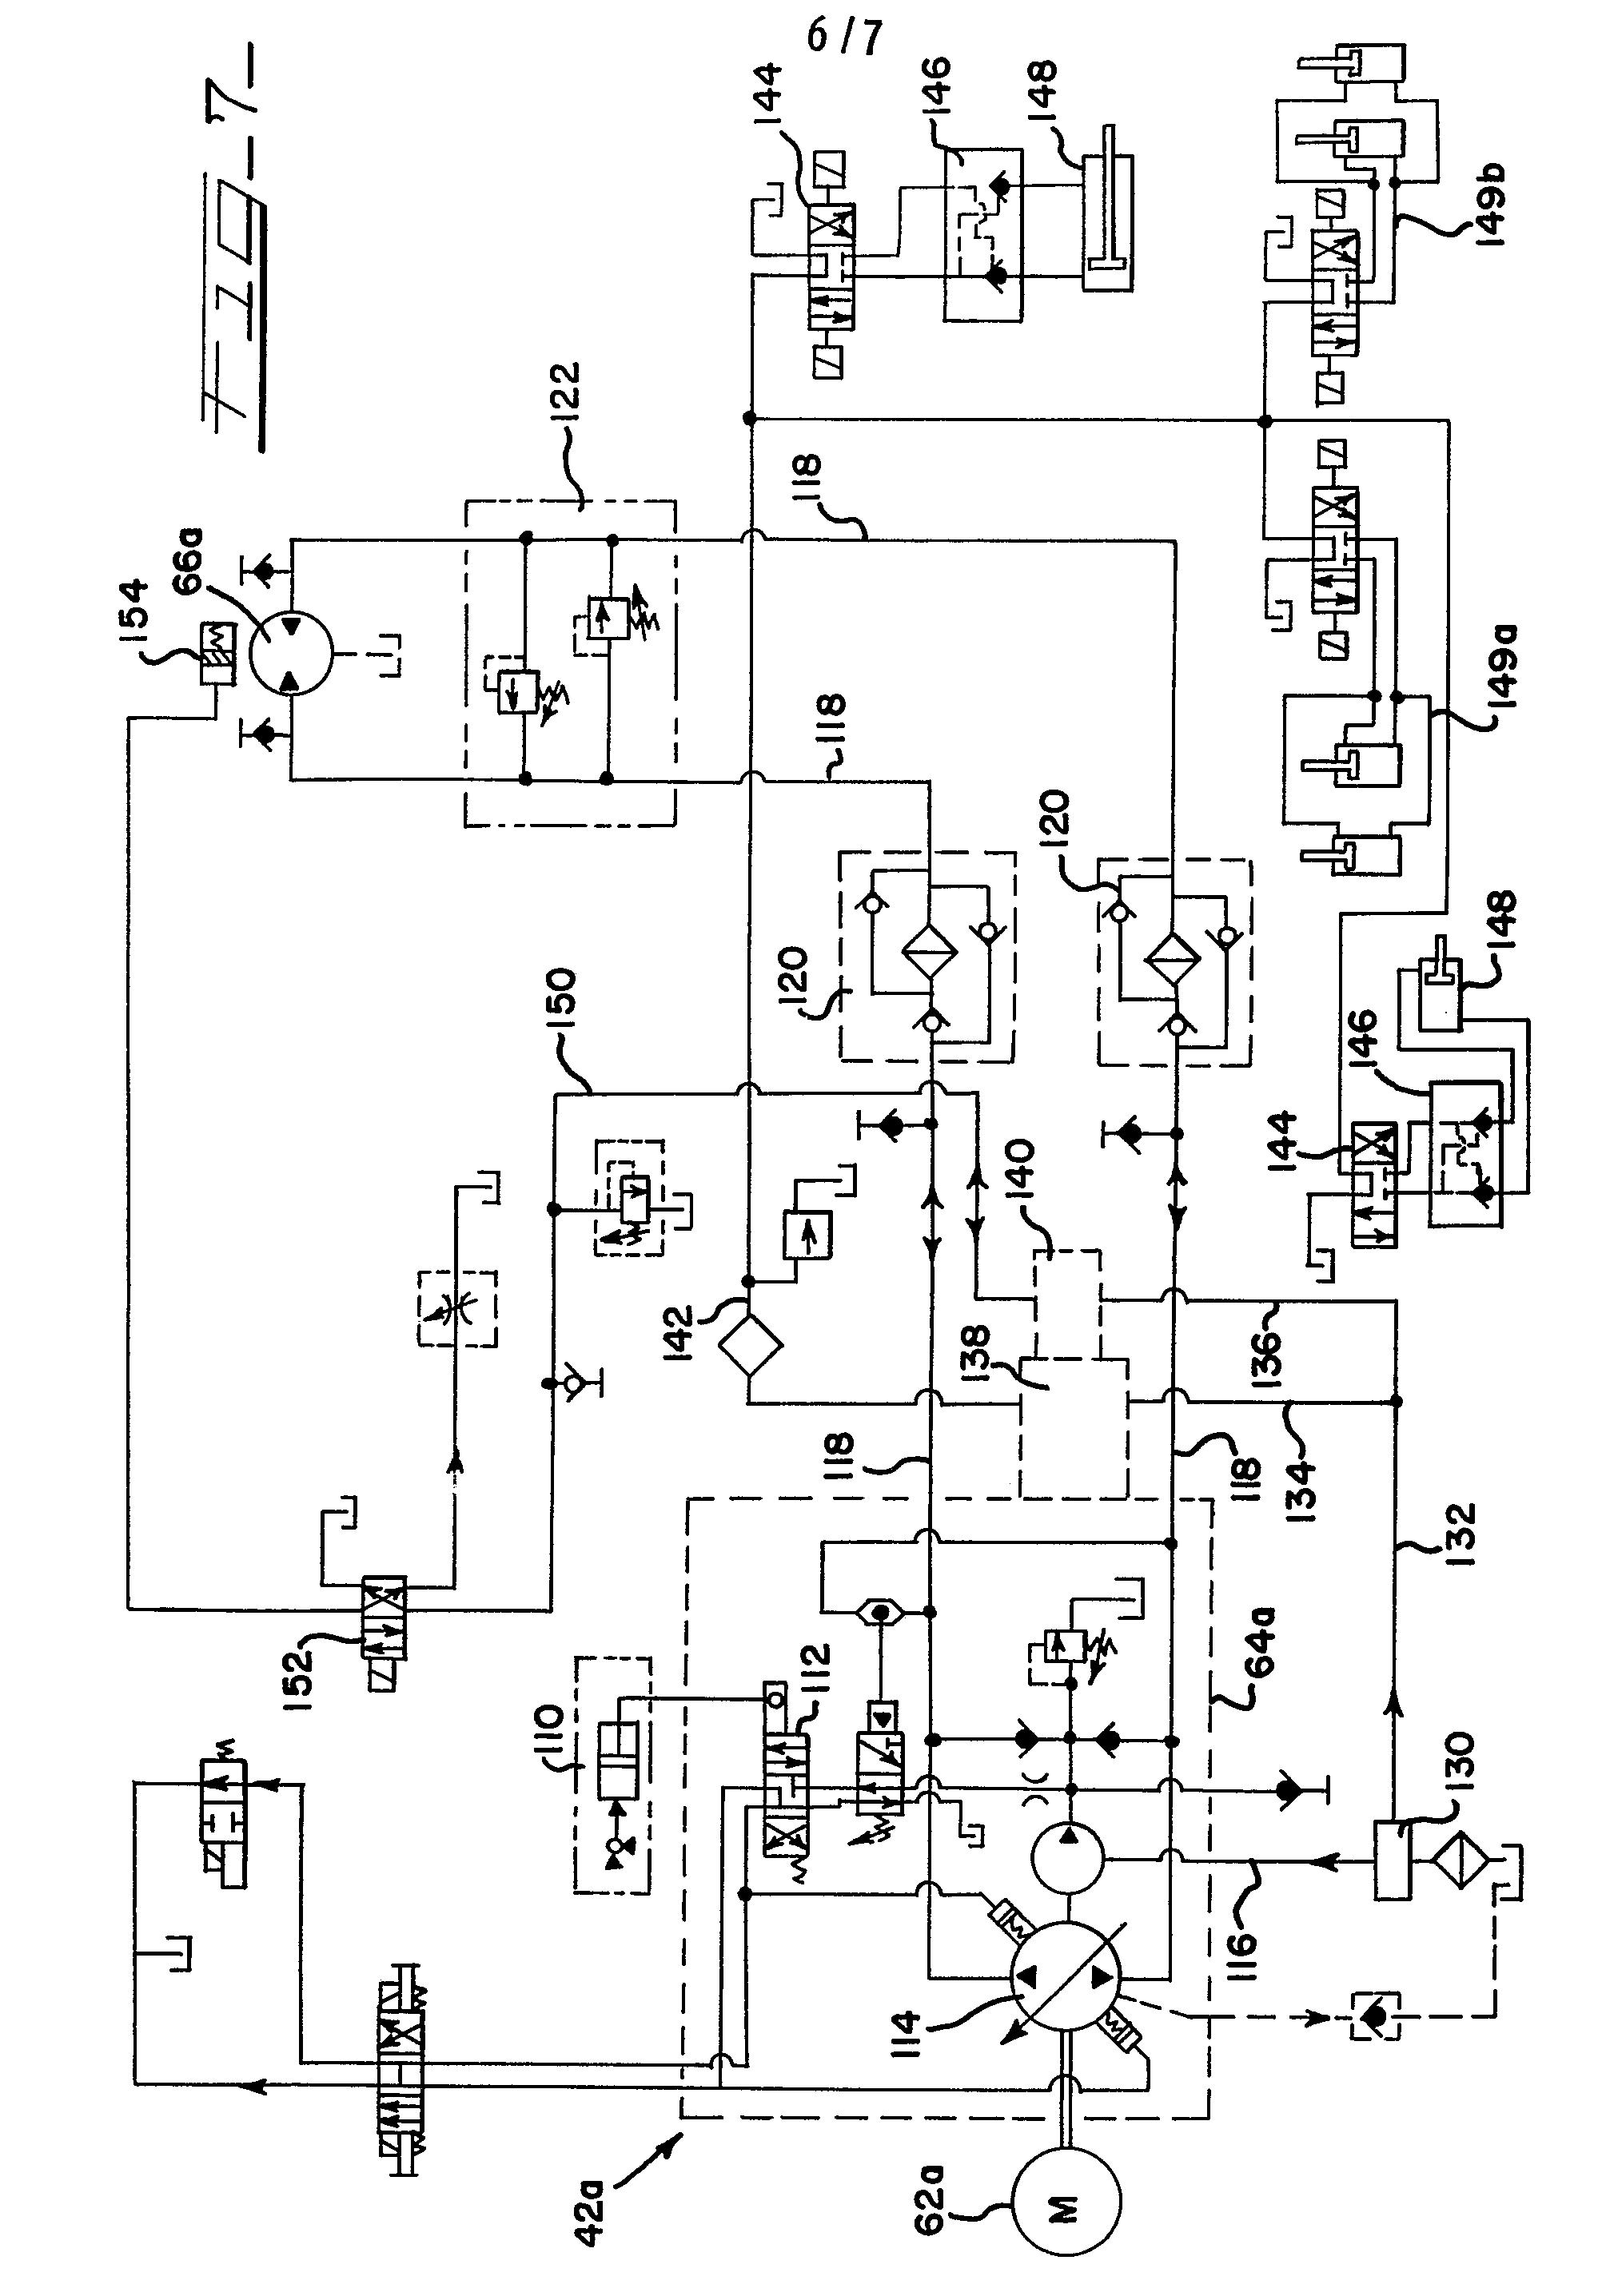 Hydraulic Motor Circuit Diagram Tractor Hydraulics Diagram